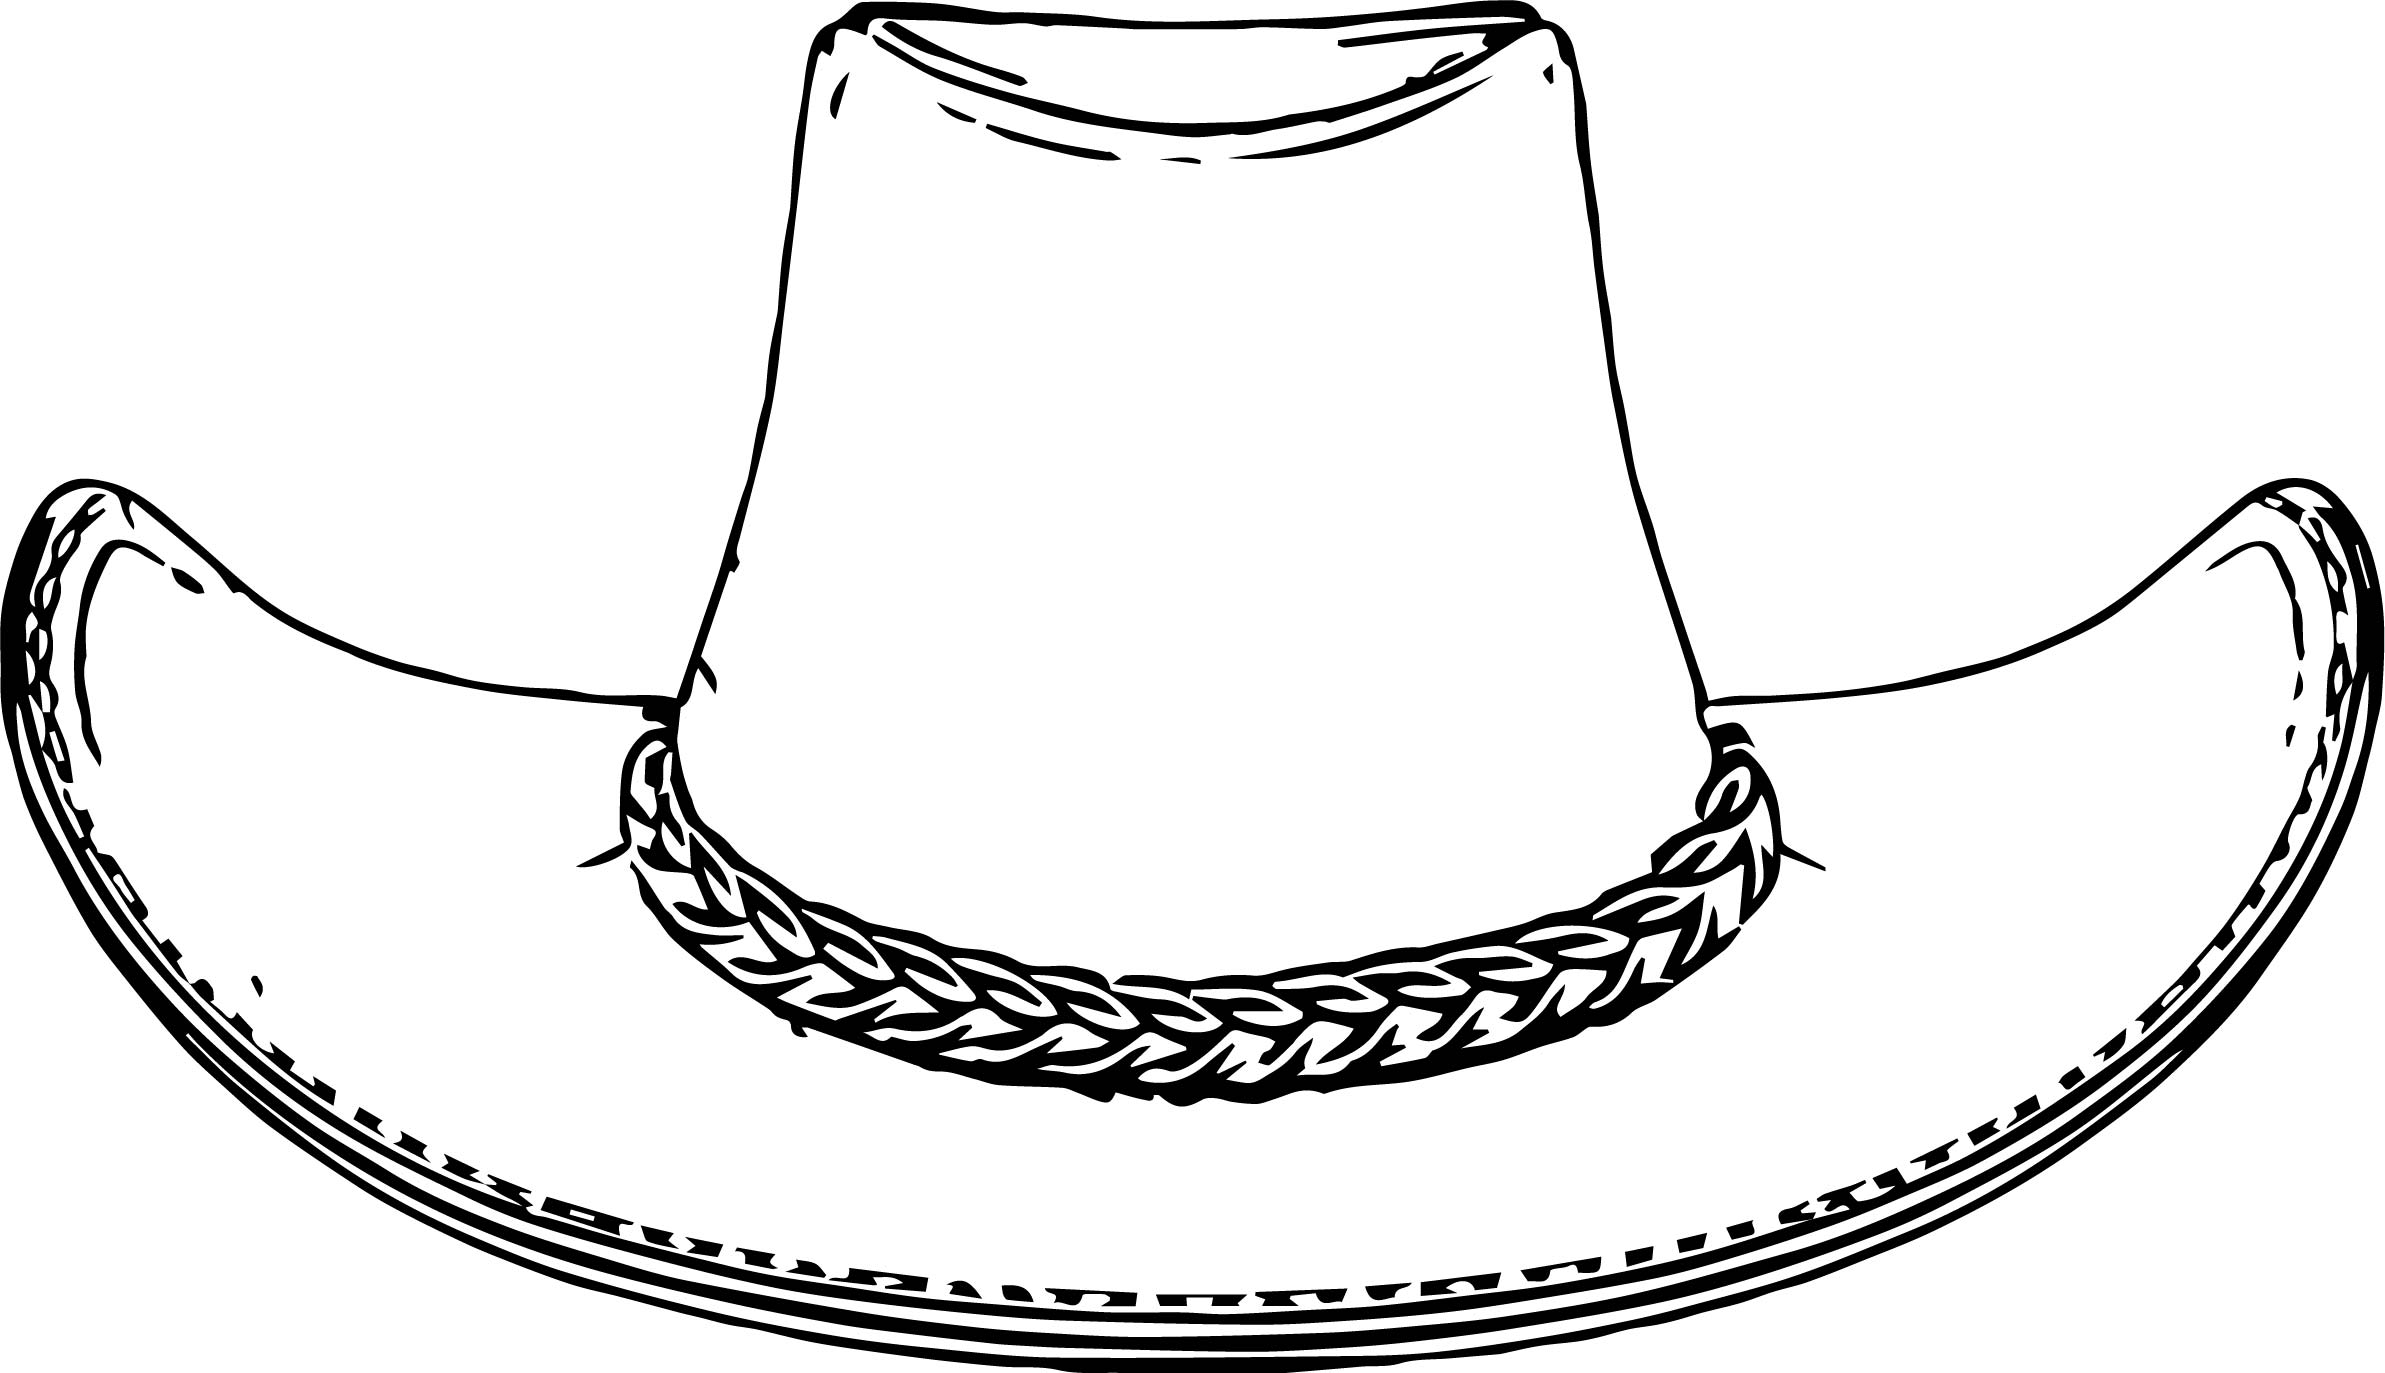 Cowboy Hat Coloring Pages Wecoloringpage Com